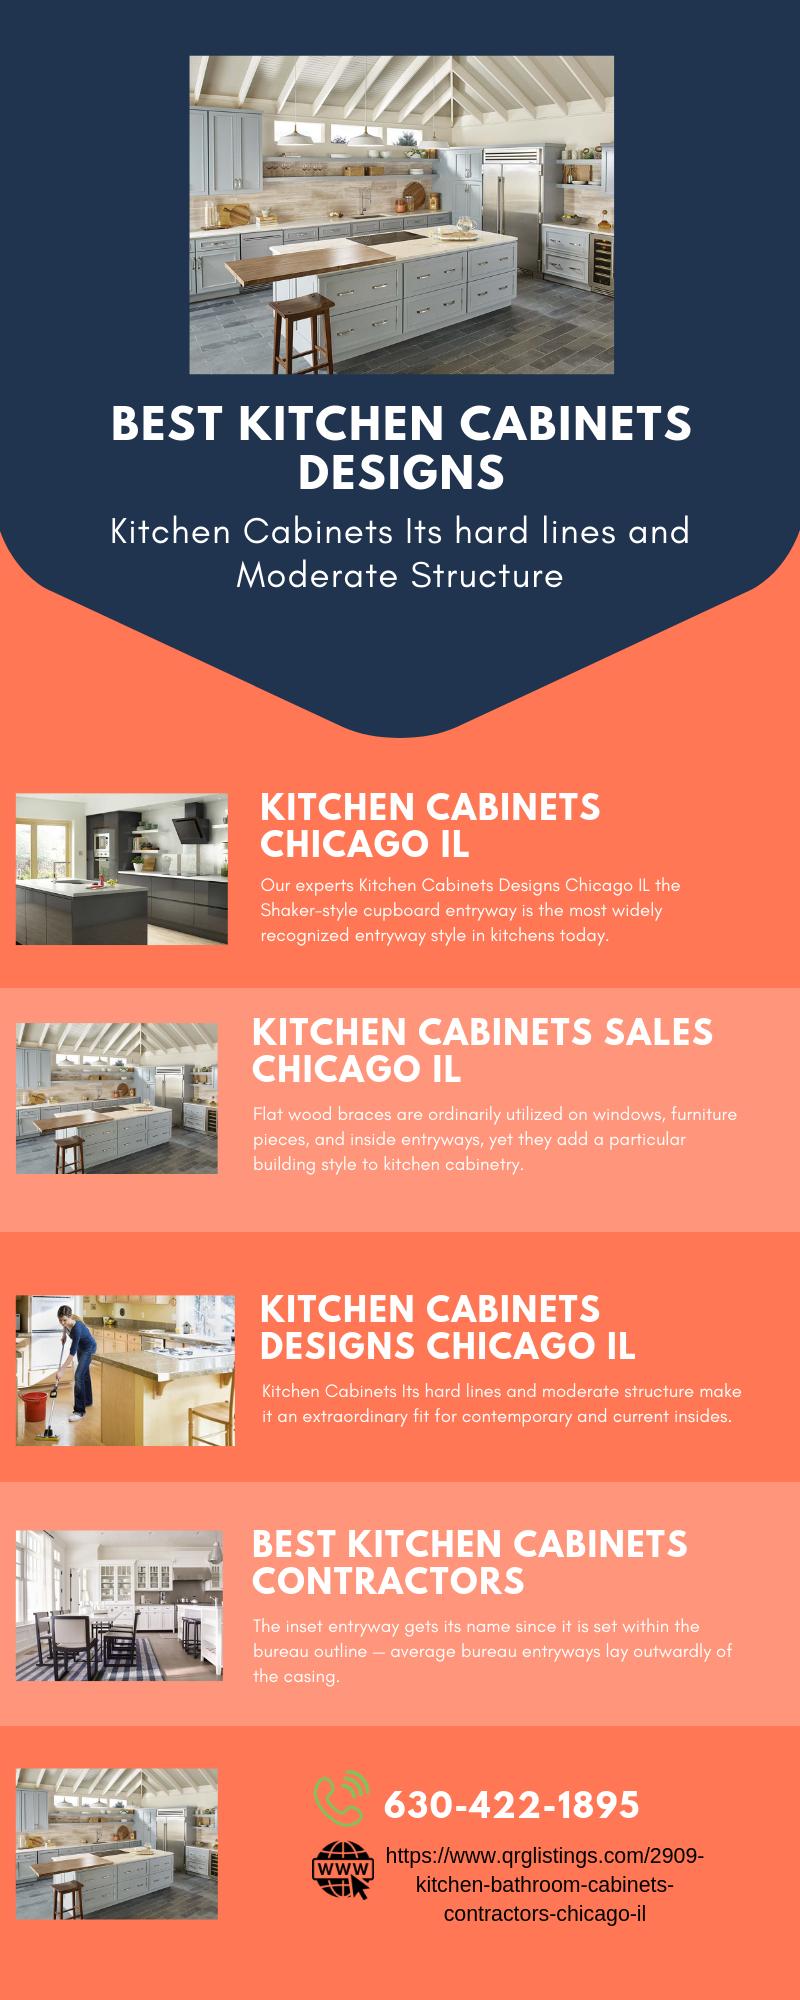 Kitchen Cabinets Contractors Chicago Il Kitchen Cabinet Design Kitchen Cabinets In Bathroom Affordable Kitchen Cabinets